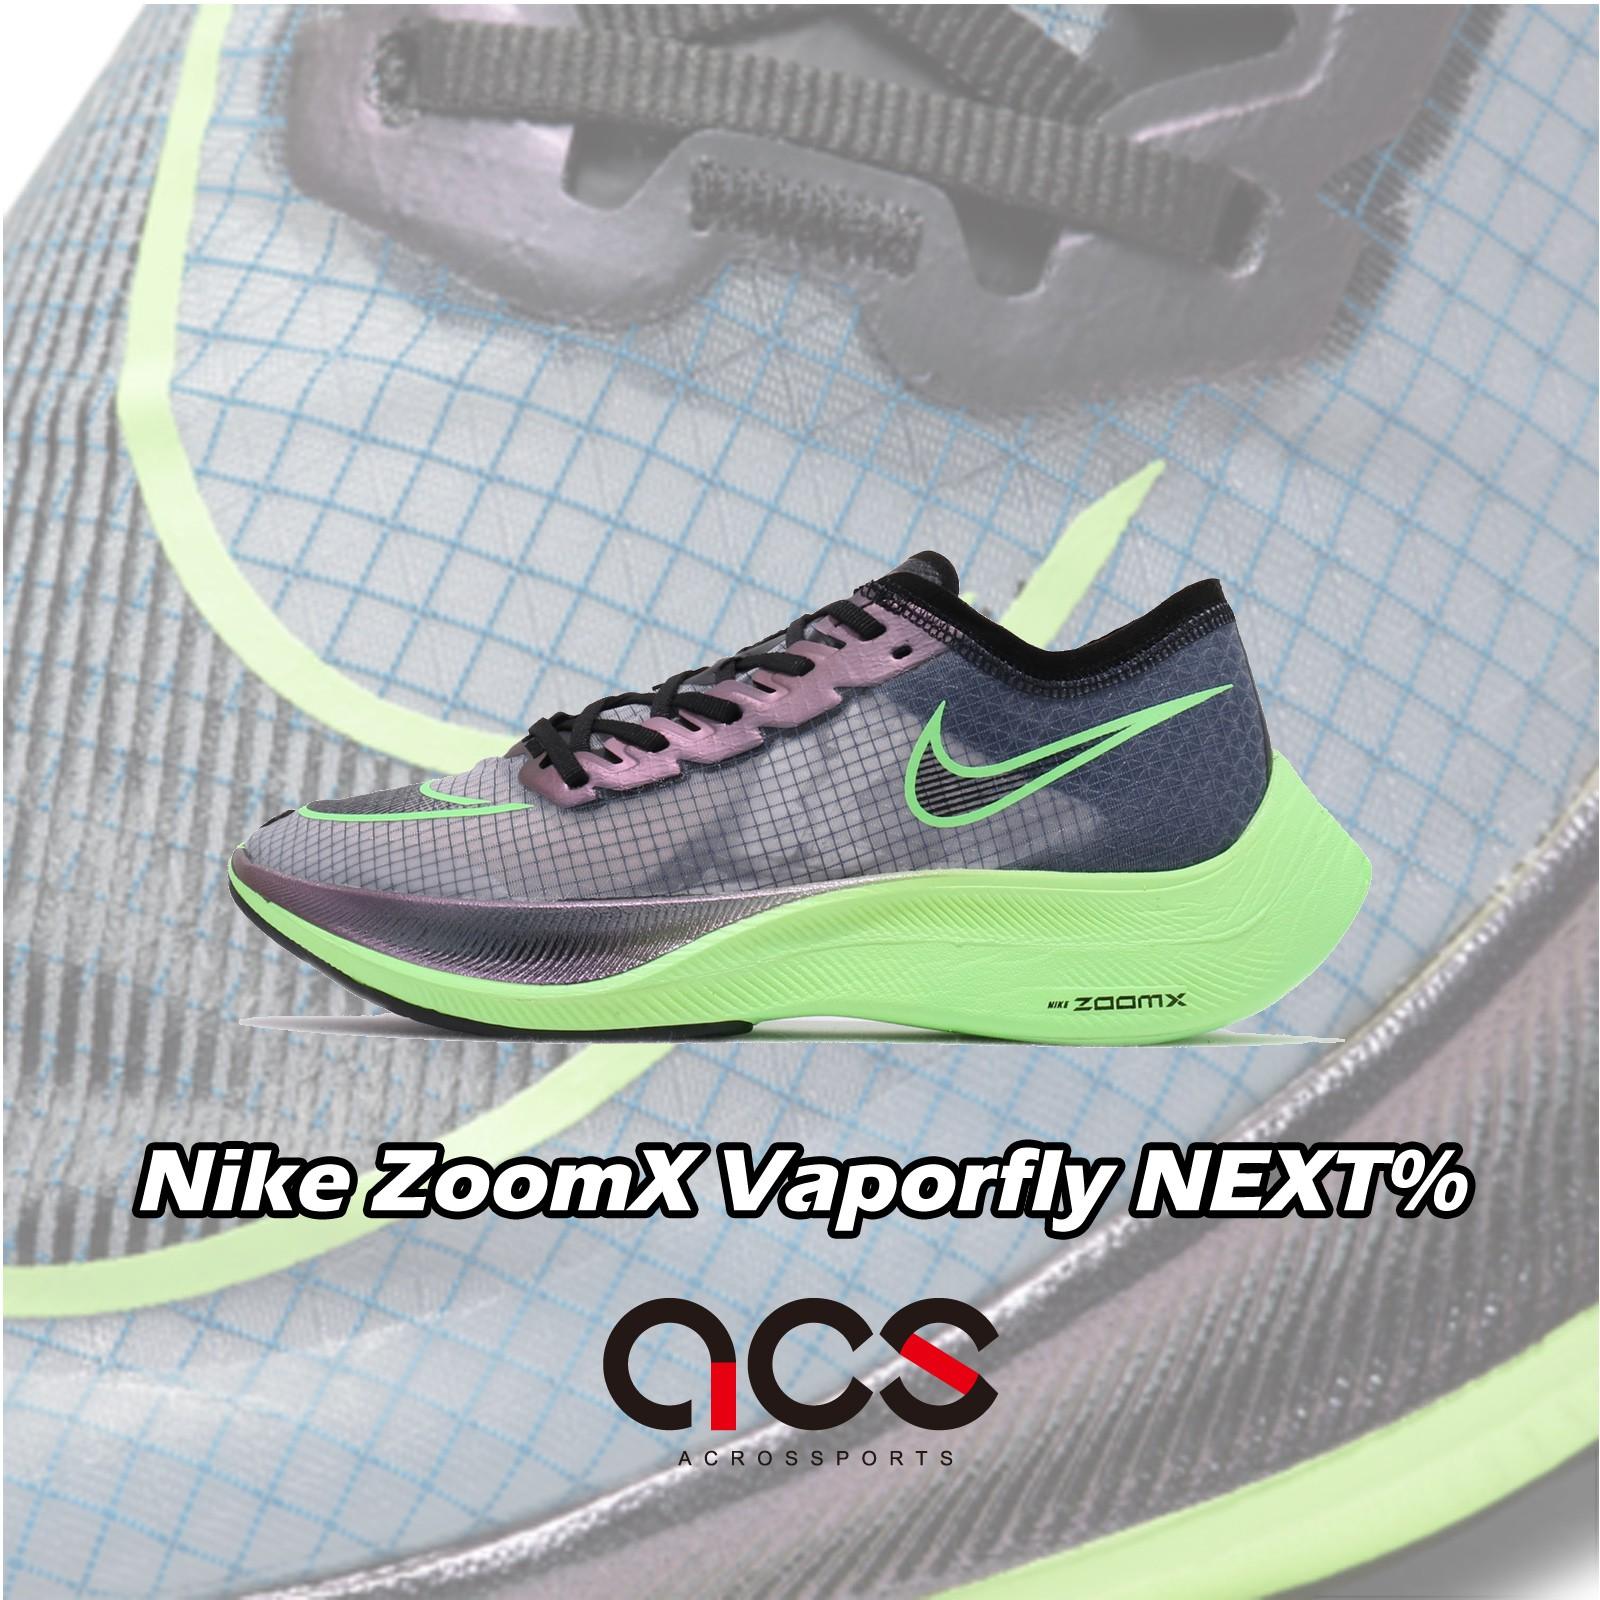 Nike 慢跑鞋 ZoomX VaporFly NEXT% 深藍 綠 男鞋 女鞋 厚底 【ACS】 AO4568-400